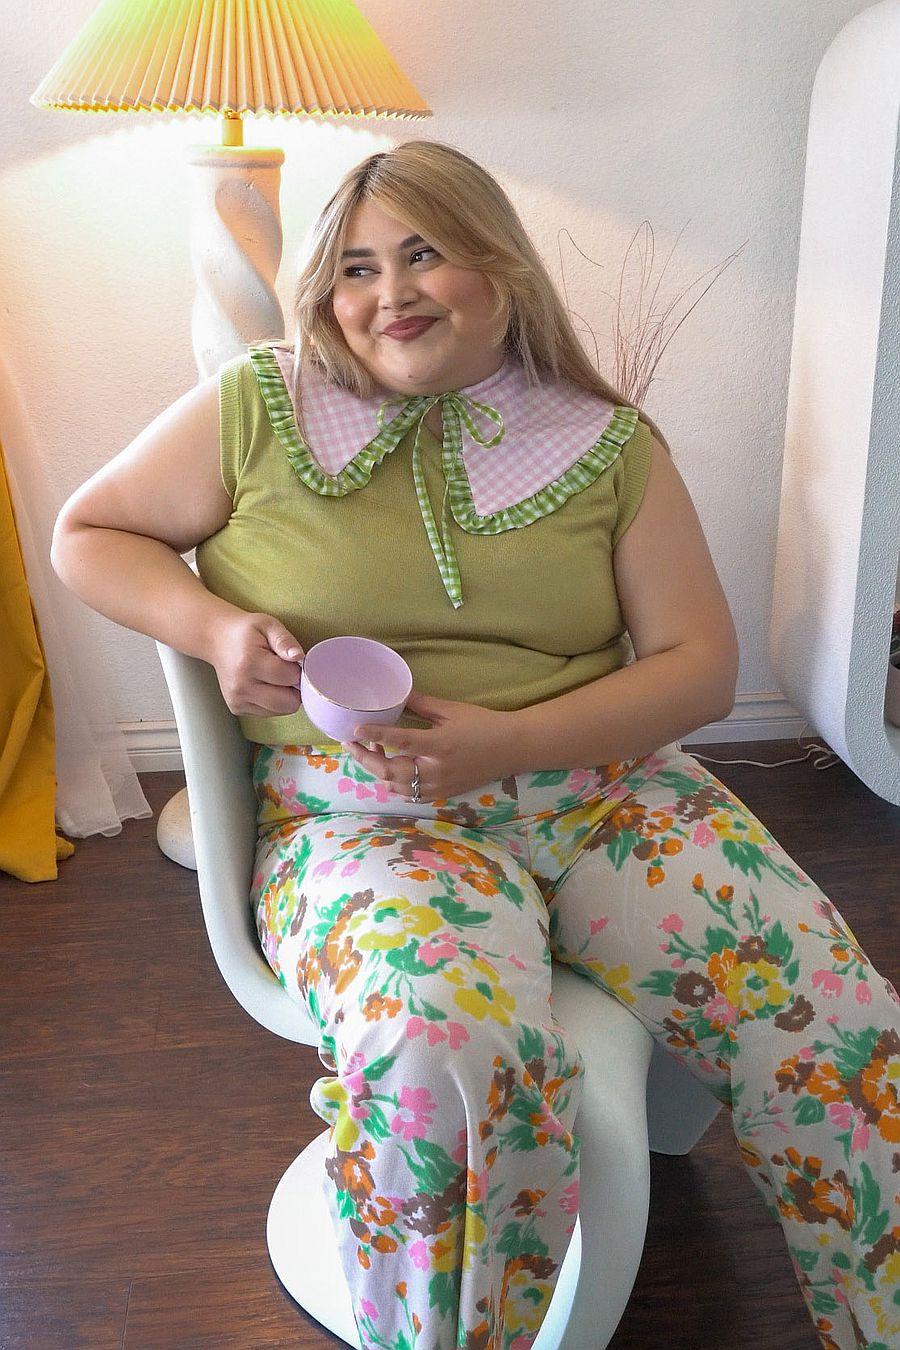 Big Baby Goes To Work Ruffle Collar - Pink/Green Gingham